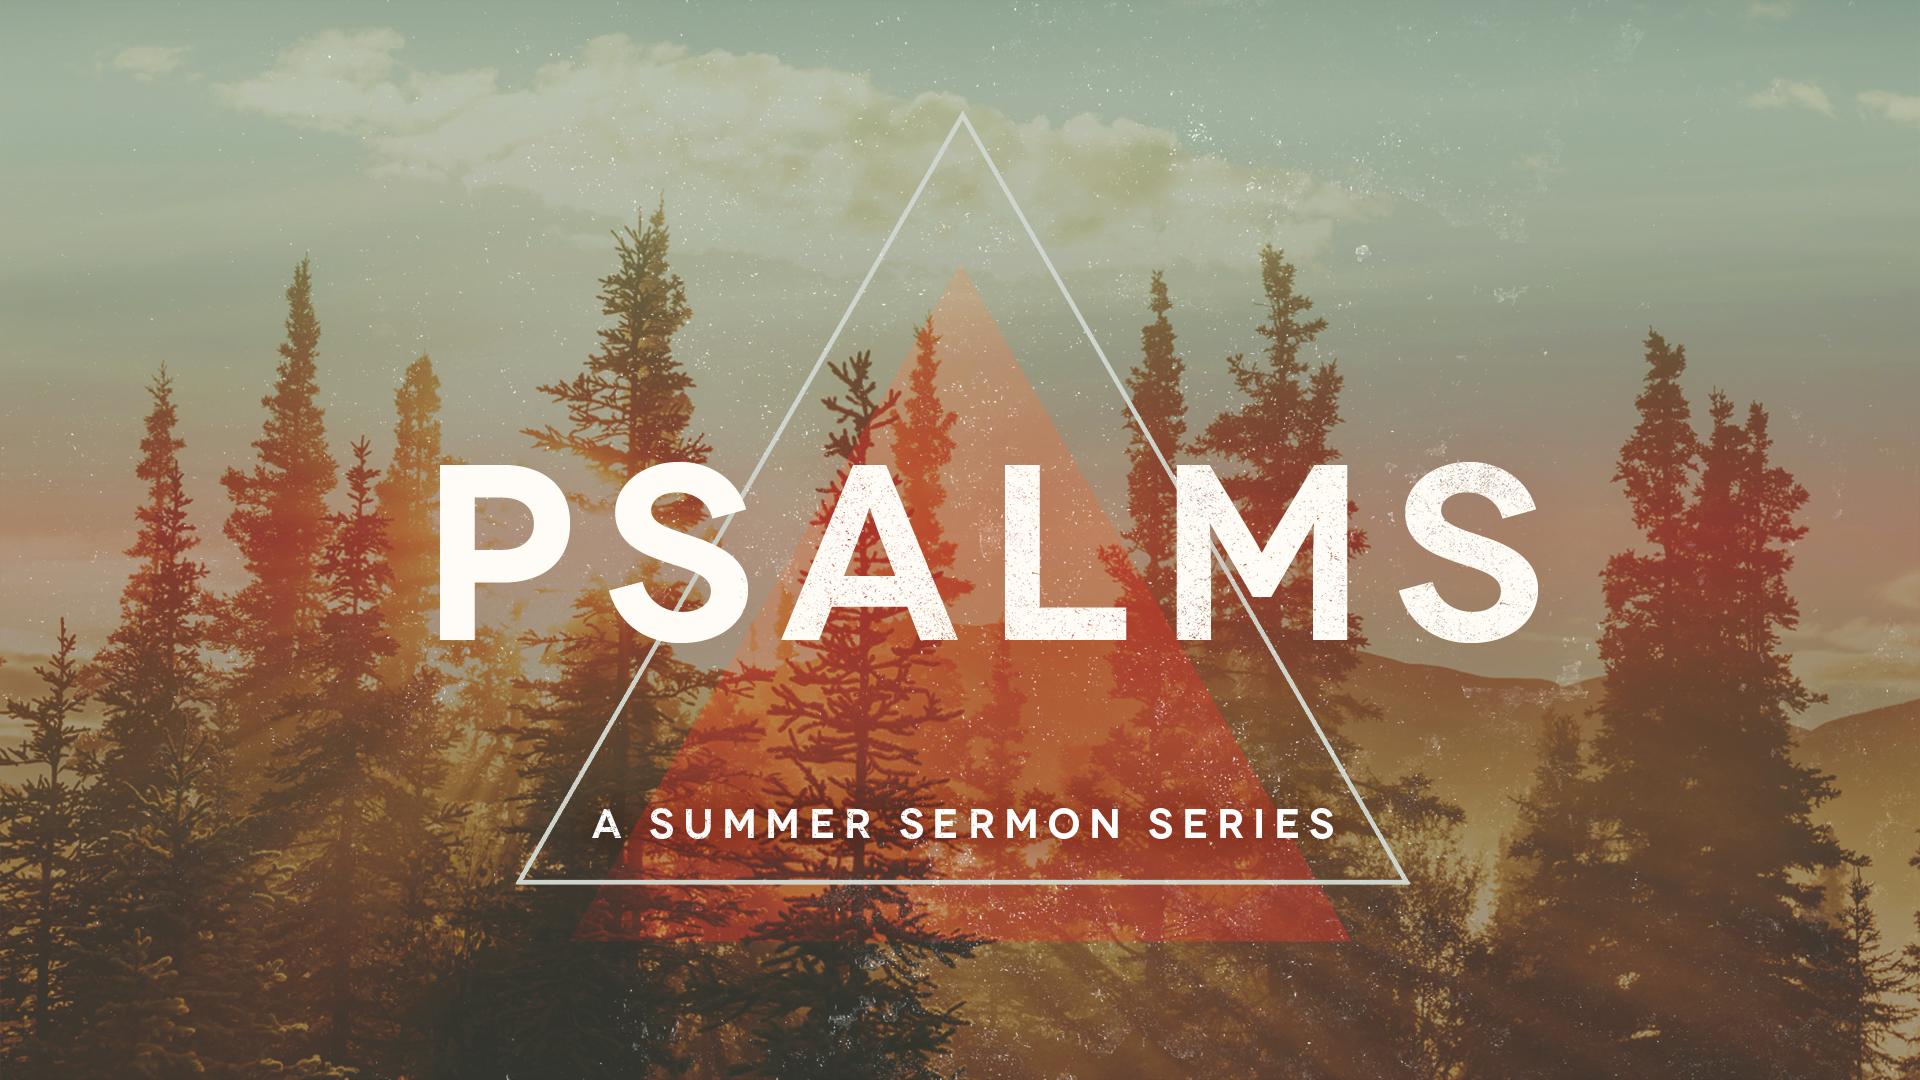 Psalm Campaign Artwork